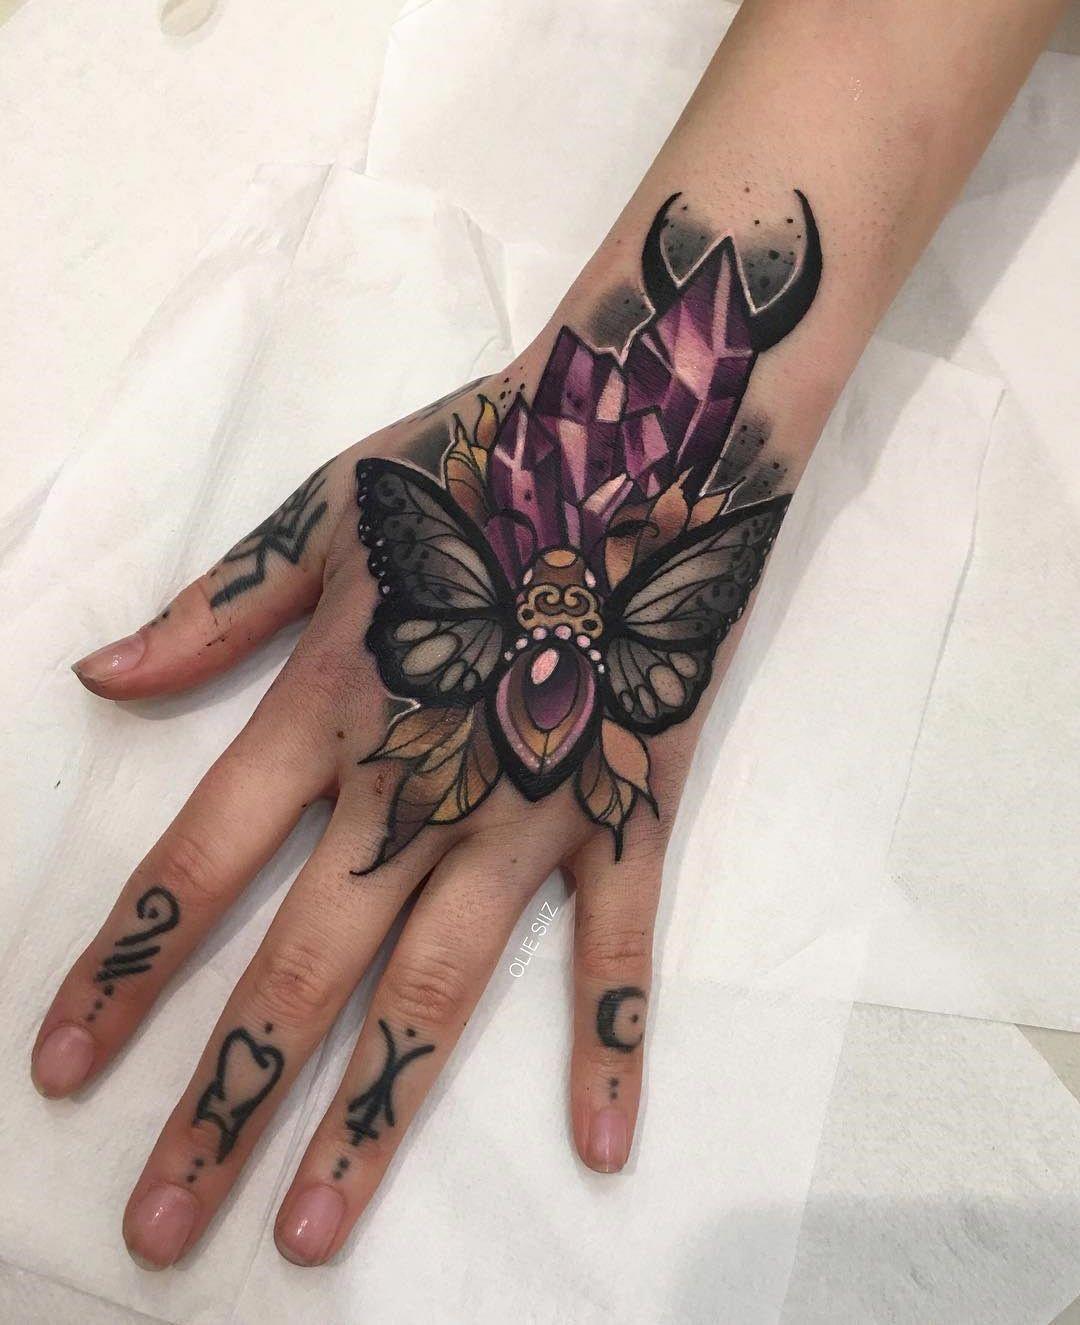 Moth Crystals Girls Hand Tattoo Best Tattoo Ideas Designs Tattooideasforwomen Bestgirl Hand Tattoos For Women Butterfly Tattoos For Women Jewel Tattoo